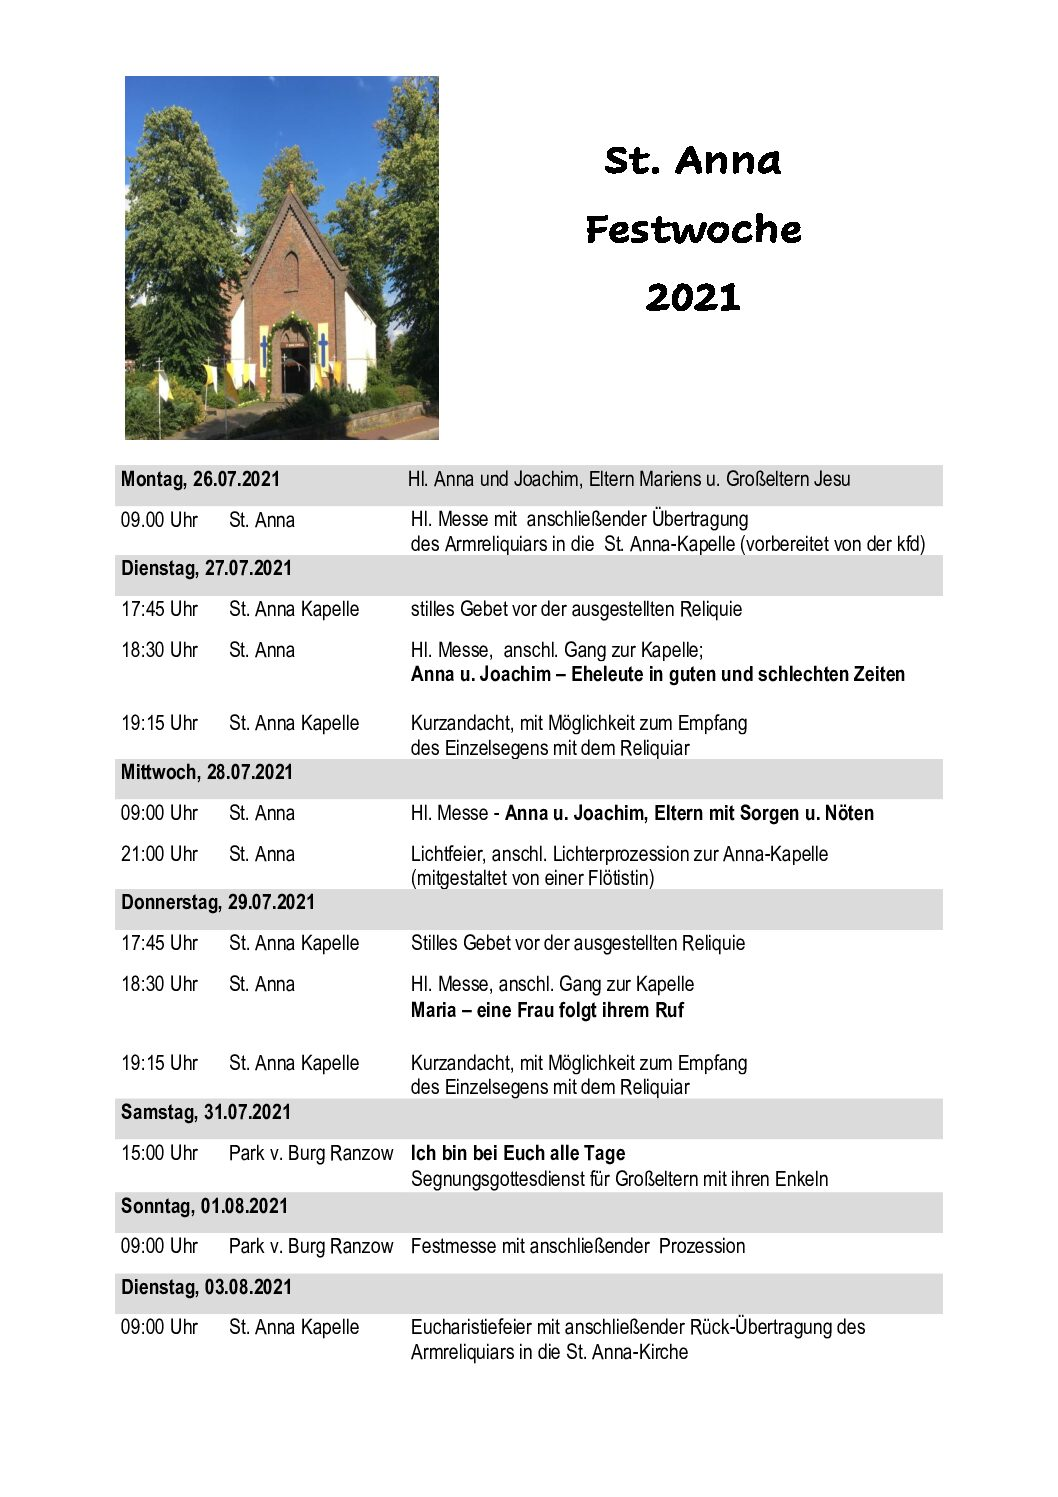 St. Anna-Fest 2021